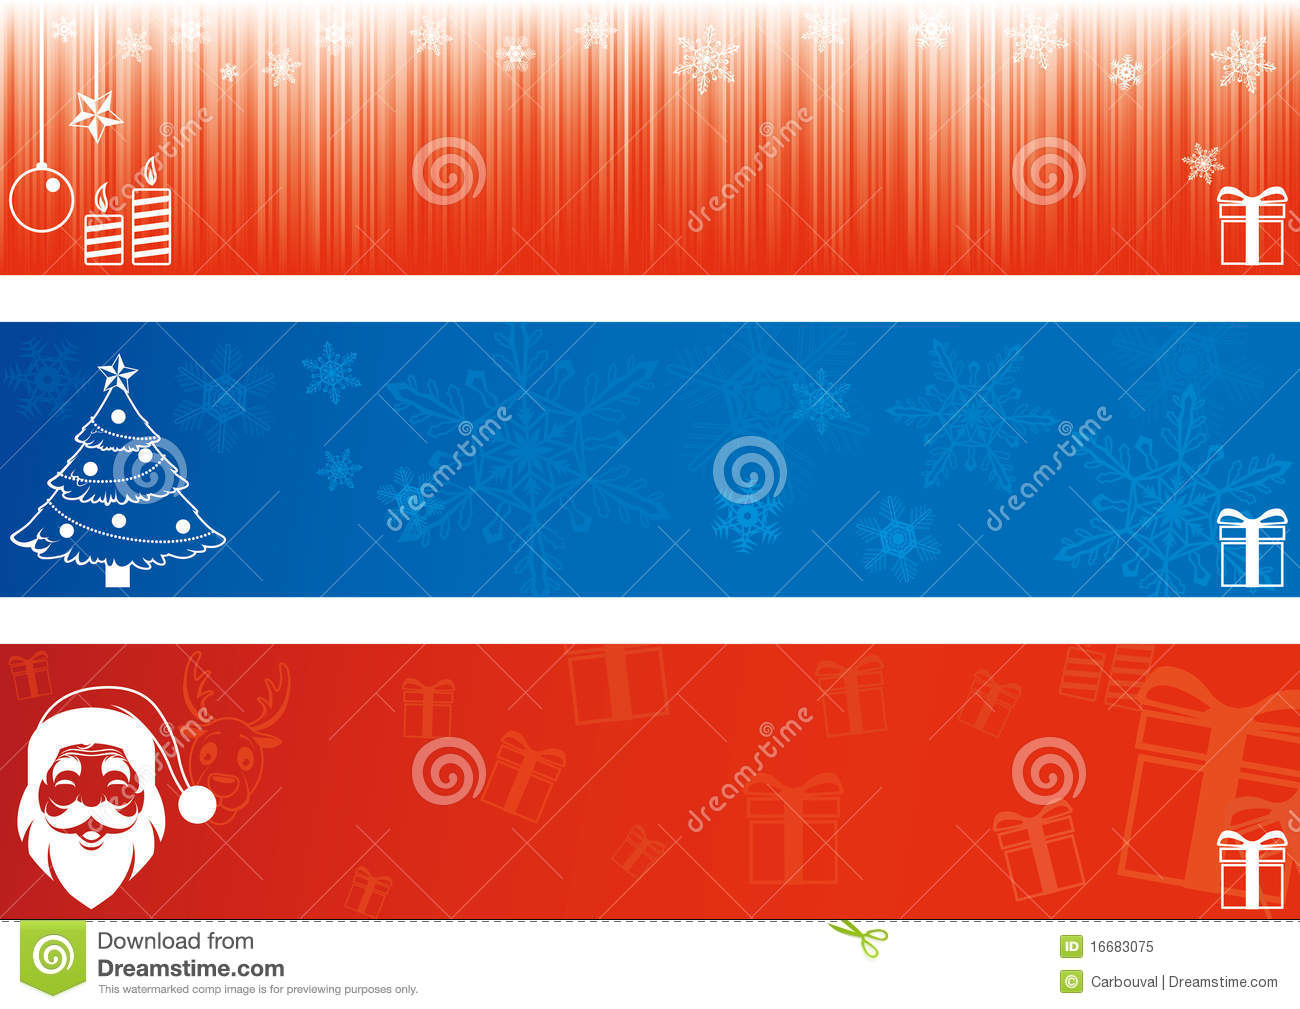 Christmas Banners 7 High Resolution Wallpaper   Hivewallpapercom 1300x1009